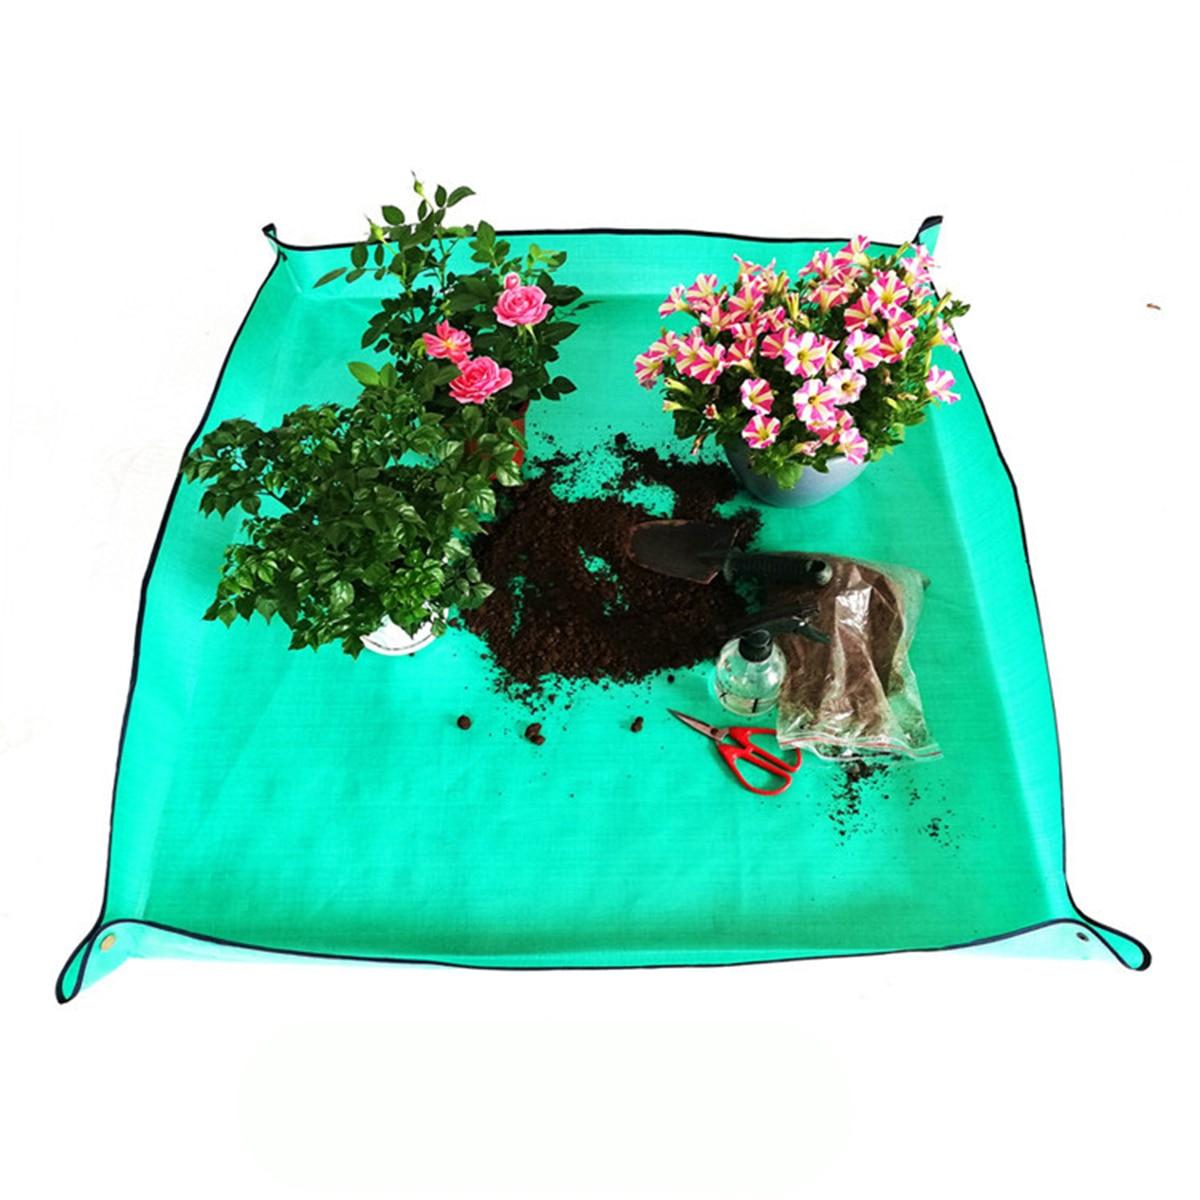 Mix Soil Flower Basin Gardening Pad Thicken Foldable Plant Change Transplanting Pot Reusable Land Mat Lock Waterproof Cushion 1